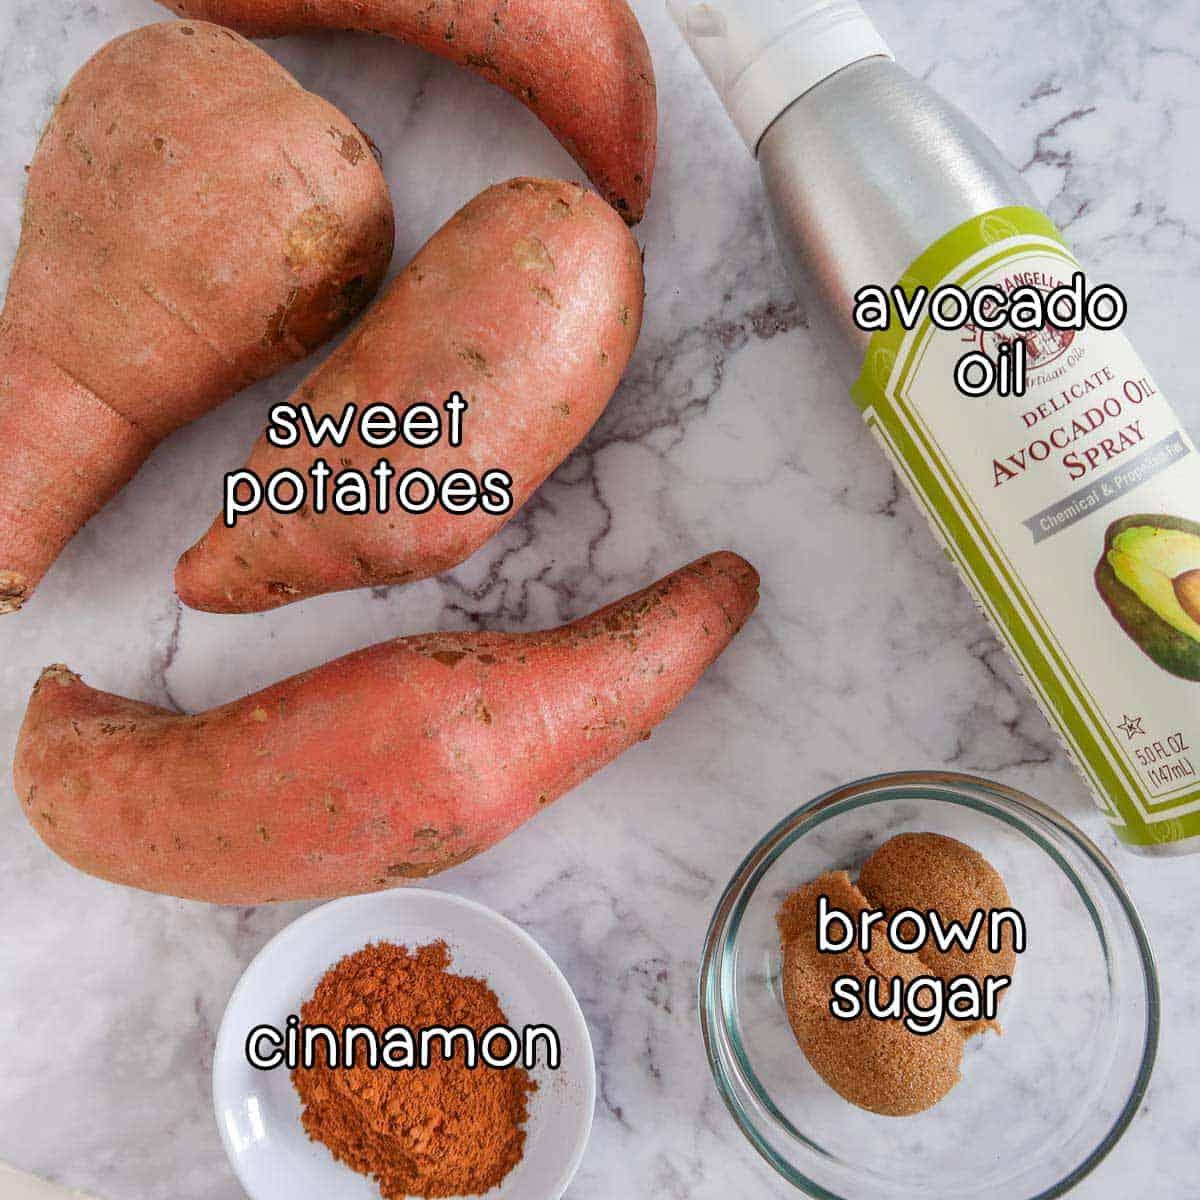 Overhead view of 4 ingredients needed to make this recipe - sweet potatoes, spray oil, cinnamon, brown sugar.